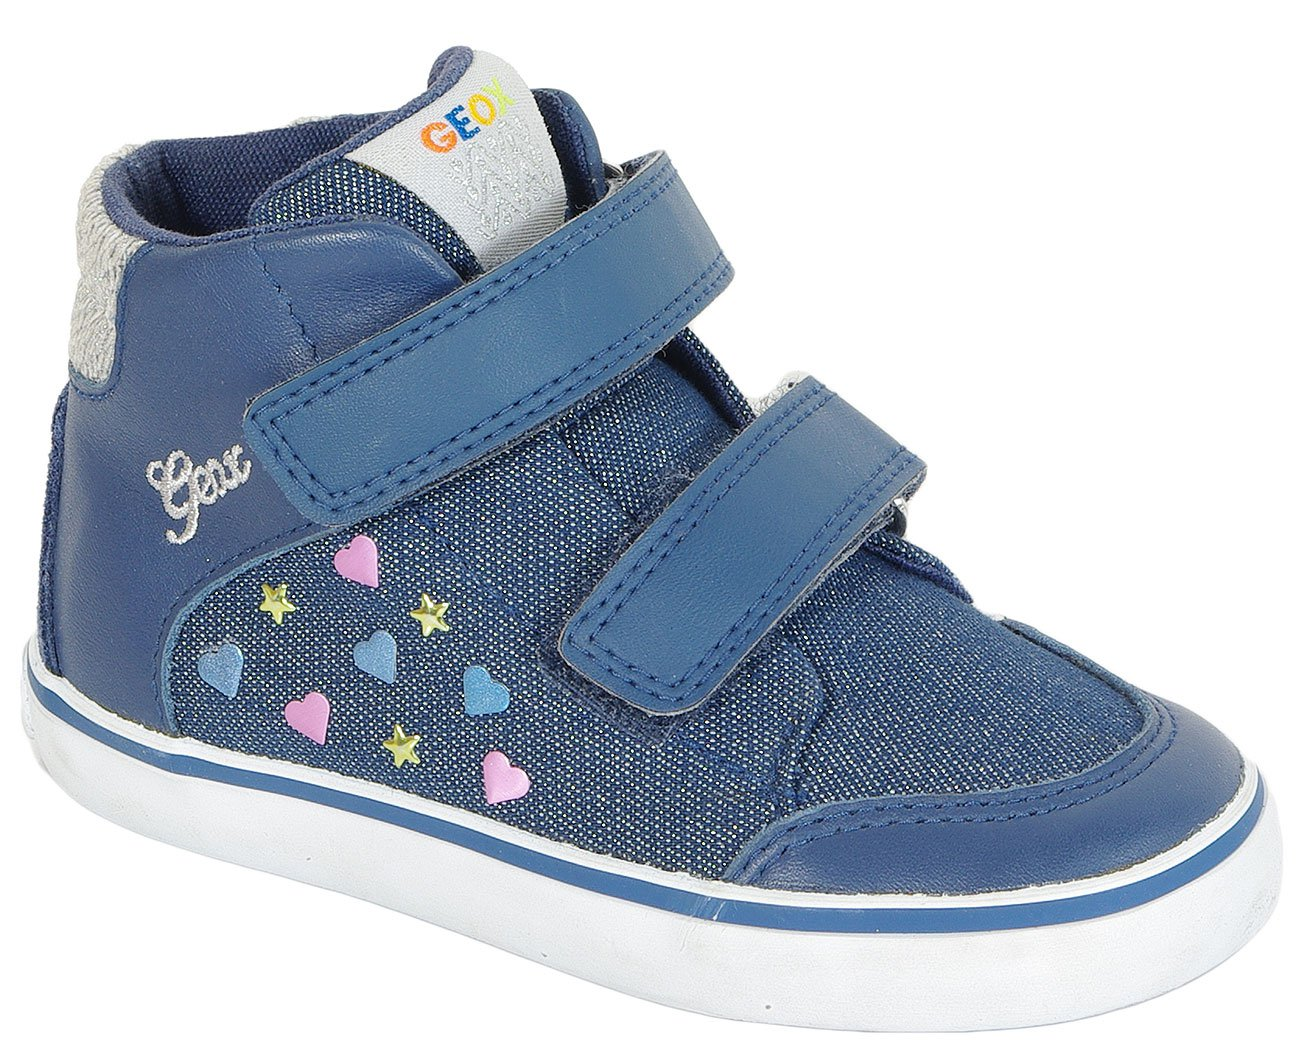 GEOX Kiwi G A Shi Denim+Nappa Navy sneakers